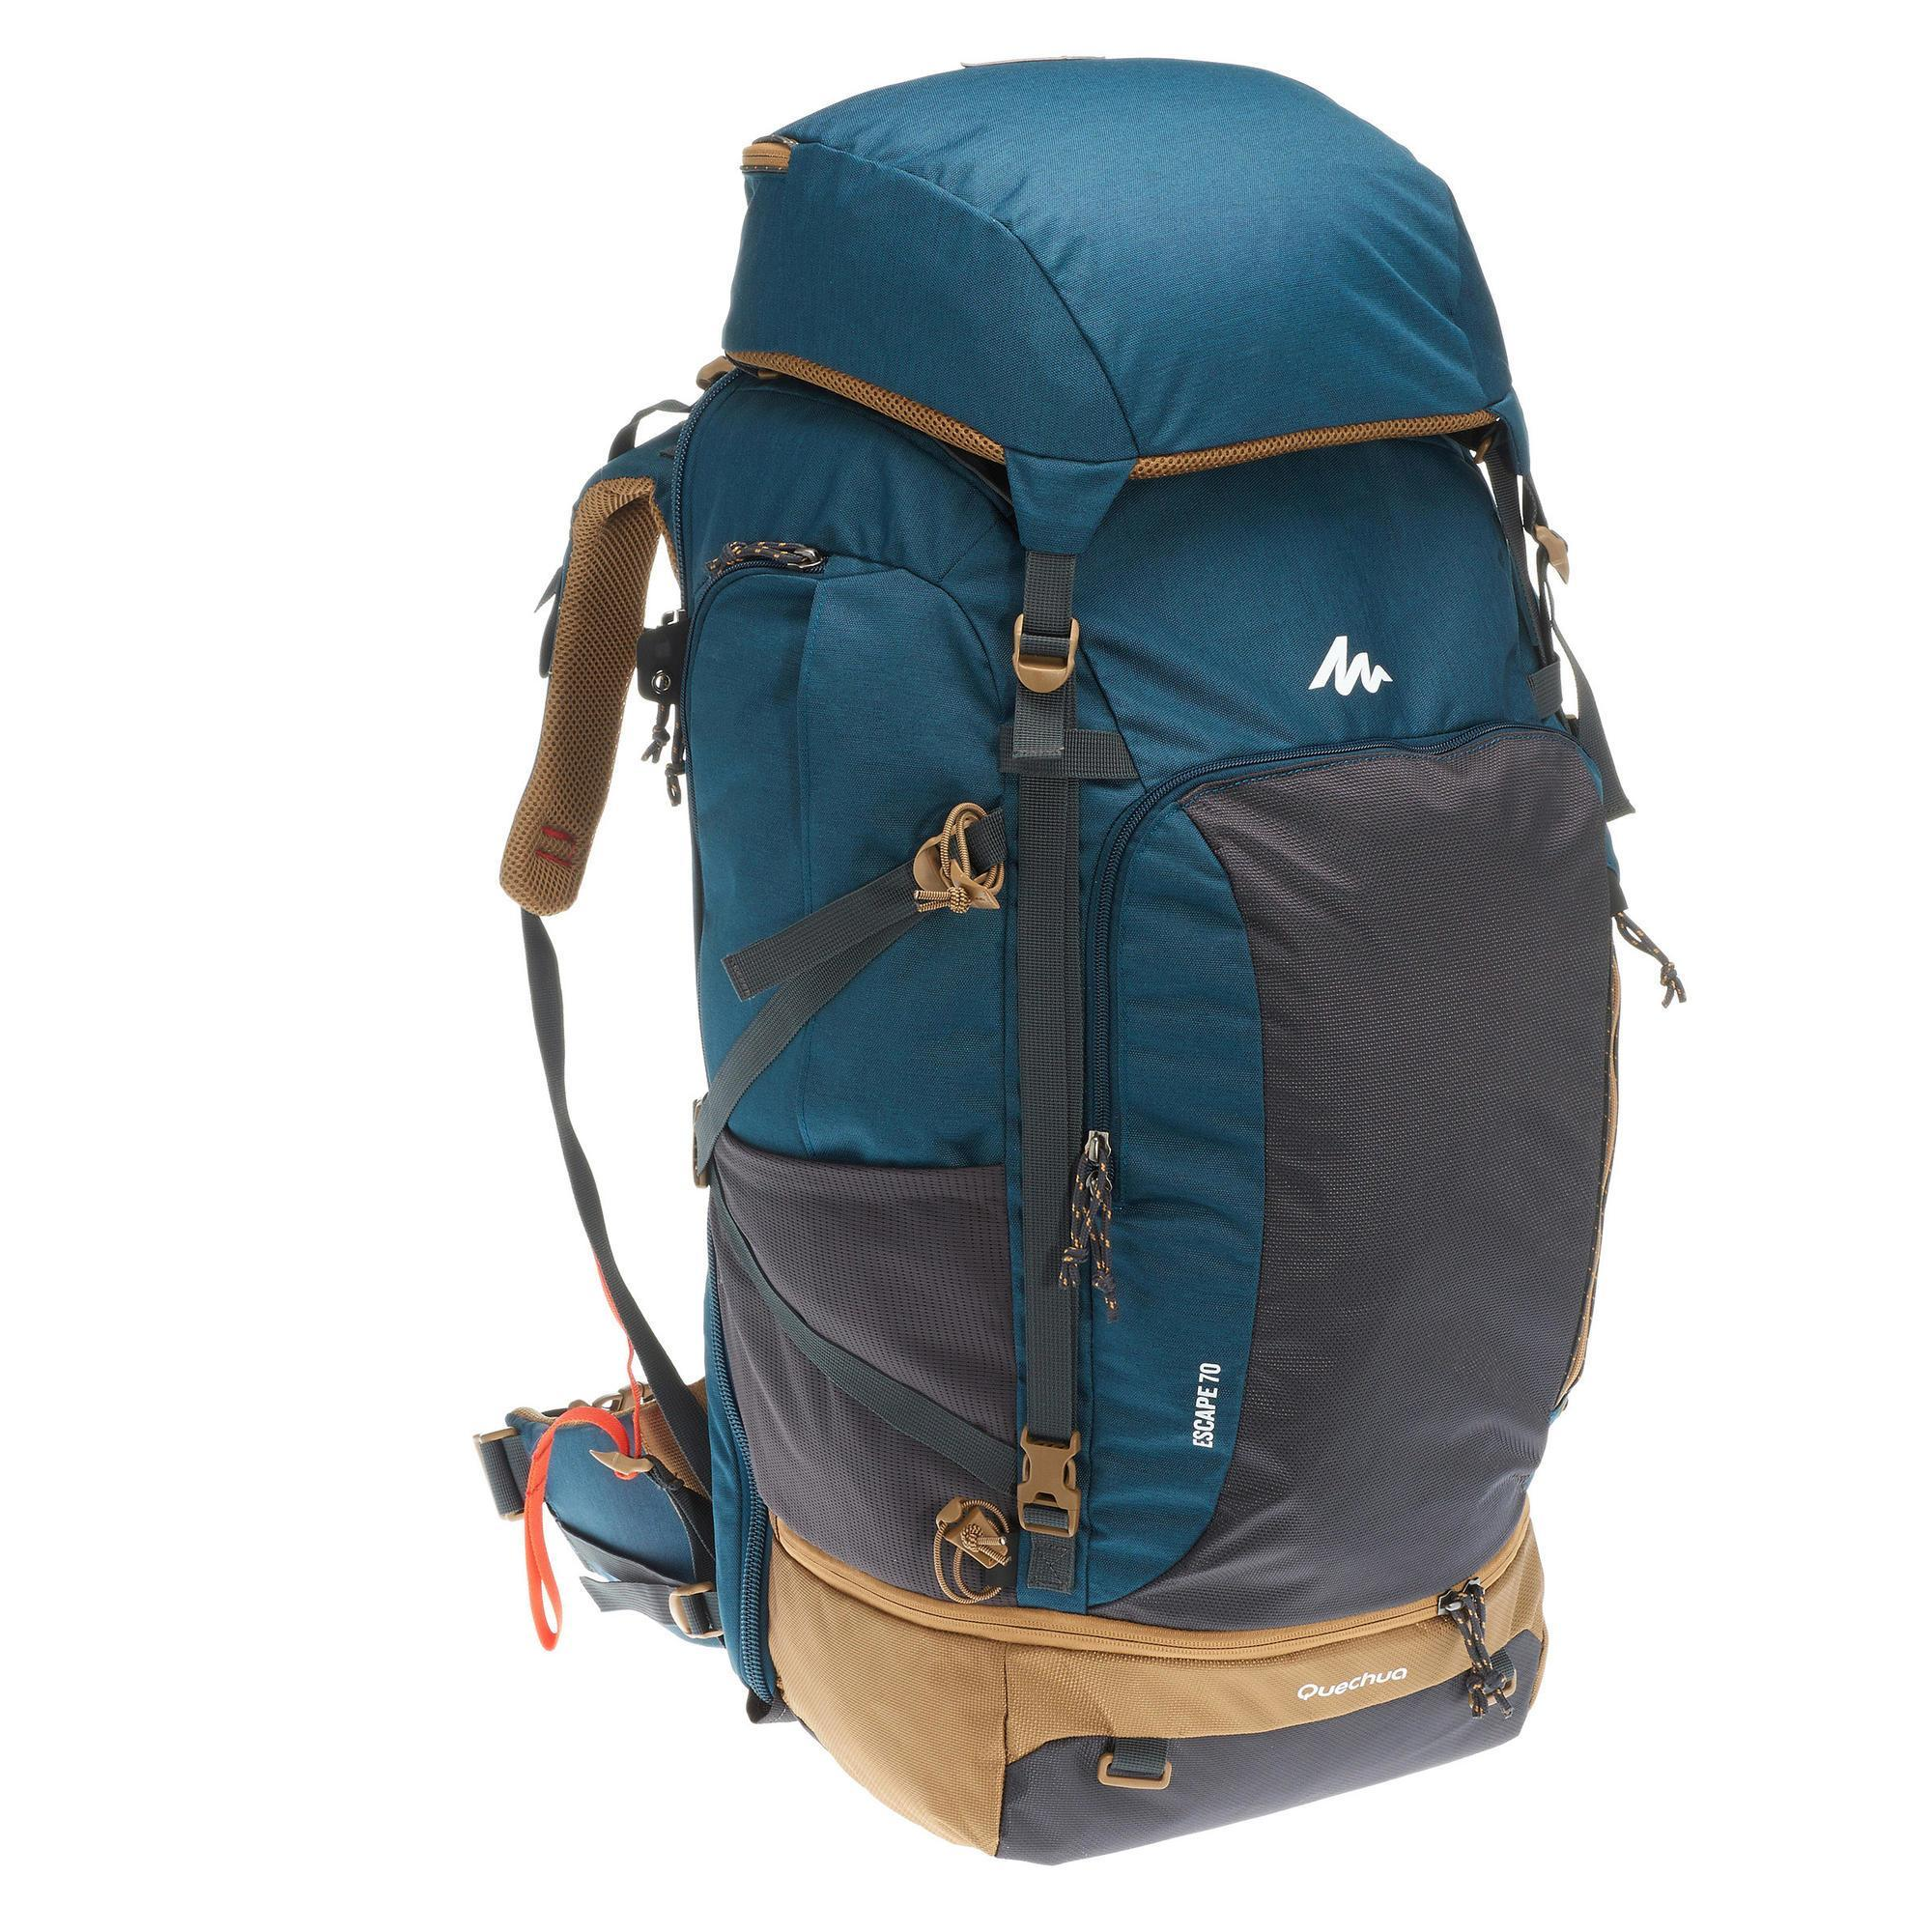 69fa7f5d6 Mochila de Montaña y Trekking Forclaz Travel500 70 Litros Hombre Azul  Forclaz